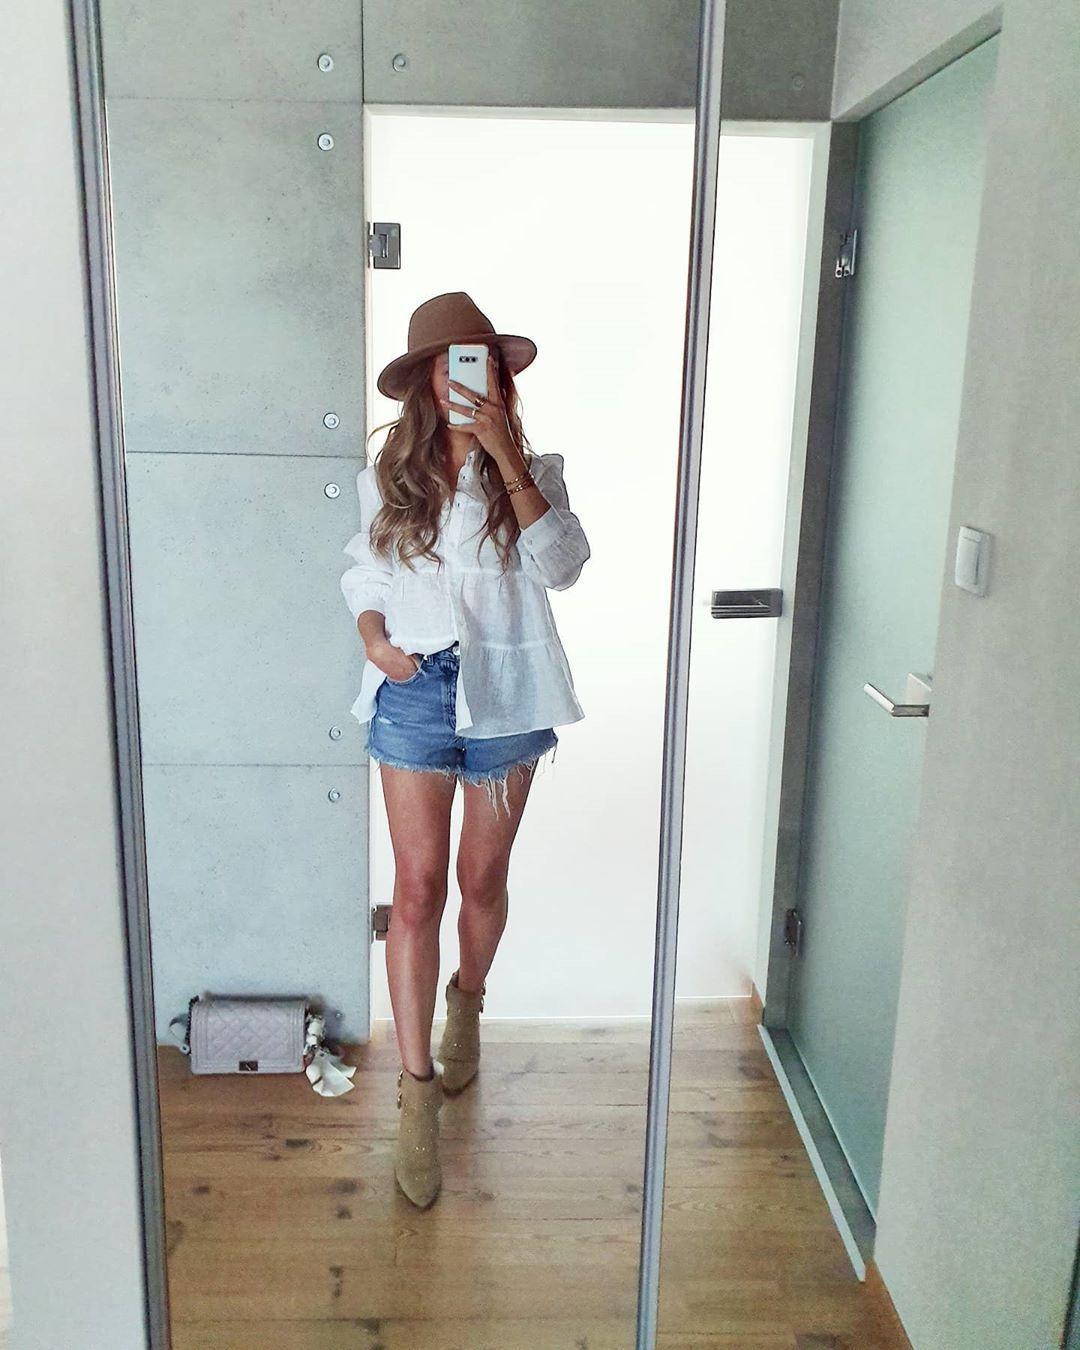 JOANNA on Instagram: #springoutfit#zaraoutfit#fashion#outfitoftheday#ootd#igootd#girloutfits#lovefashion#lookoftheday#styleoftheday#streetstyle#lookbook#fashionblog#modeblog#zaralovers#instafashionista#womenoutfits#denim#whiteshirt#zaralook#instaoutfit#springlook#fashionbloggers#